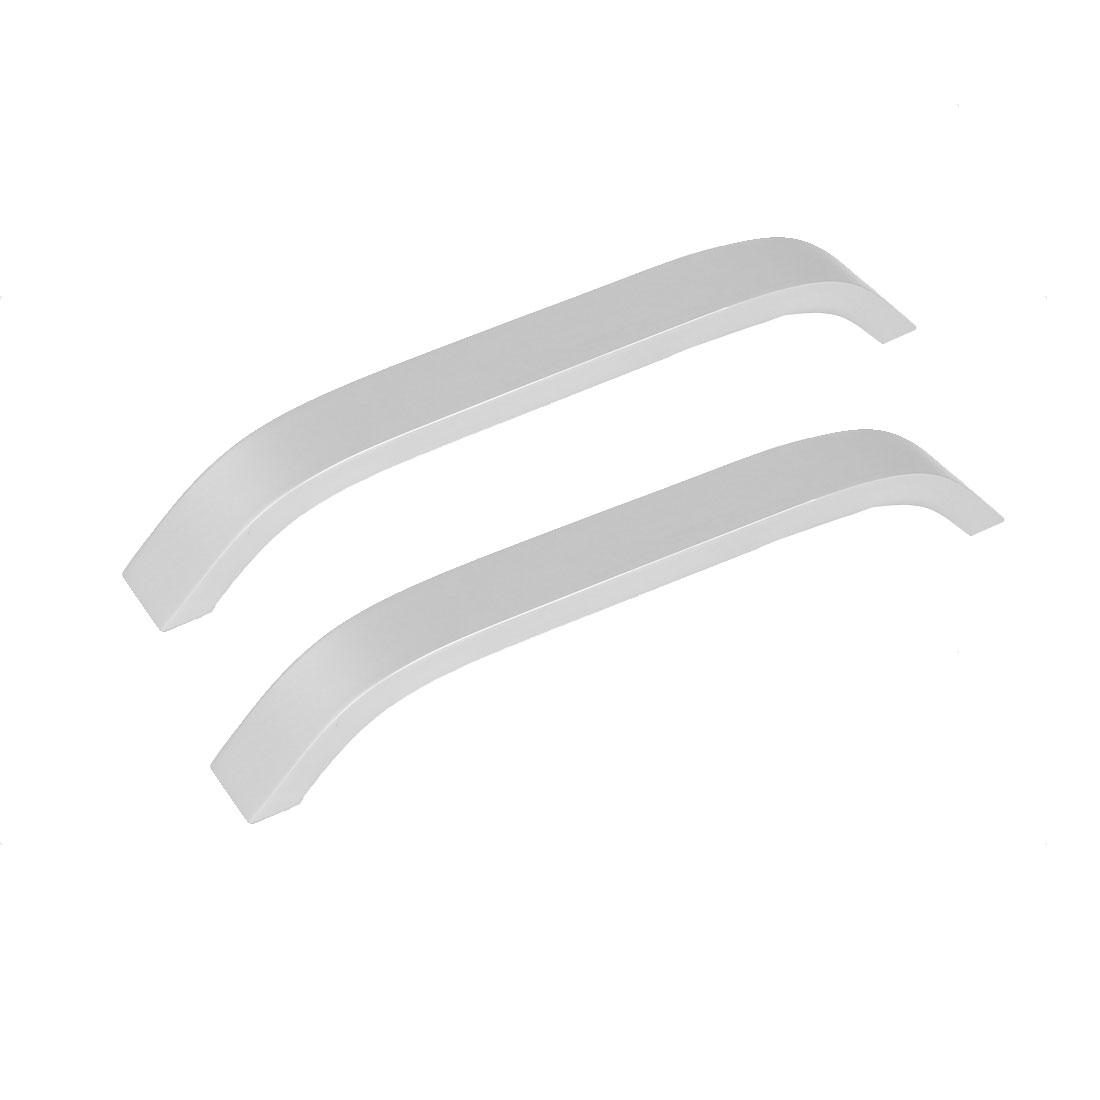 Home Cupboard Closet Aluminium Alloy Pull Handle Silver Tone 207mm Length 2pcs